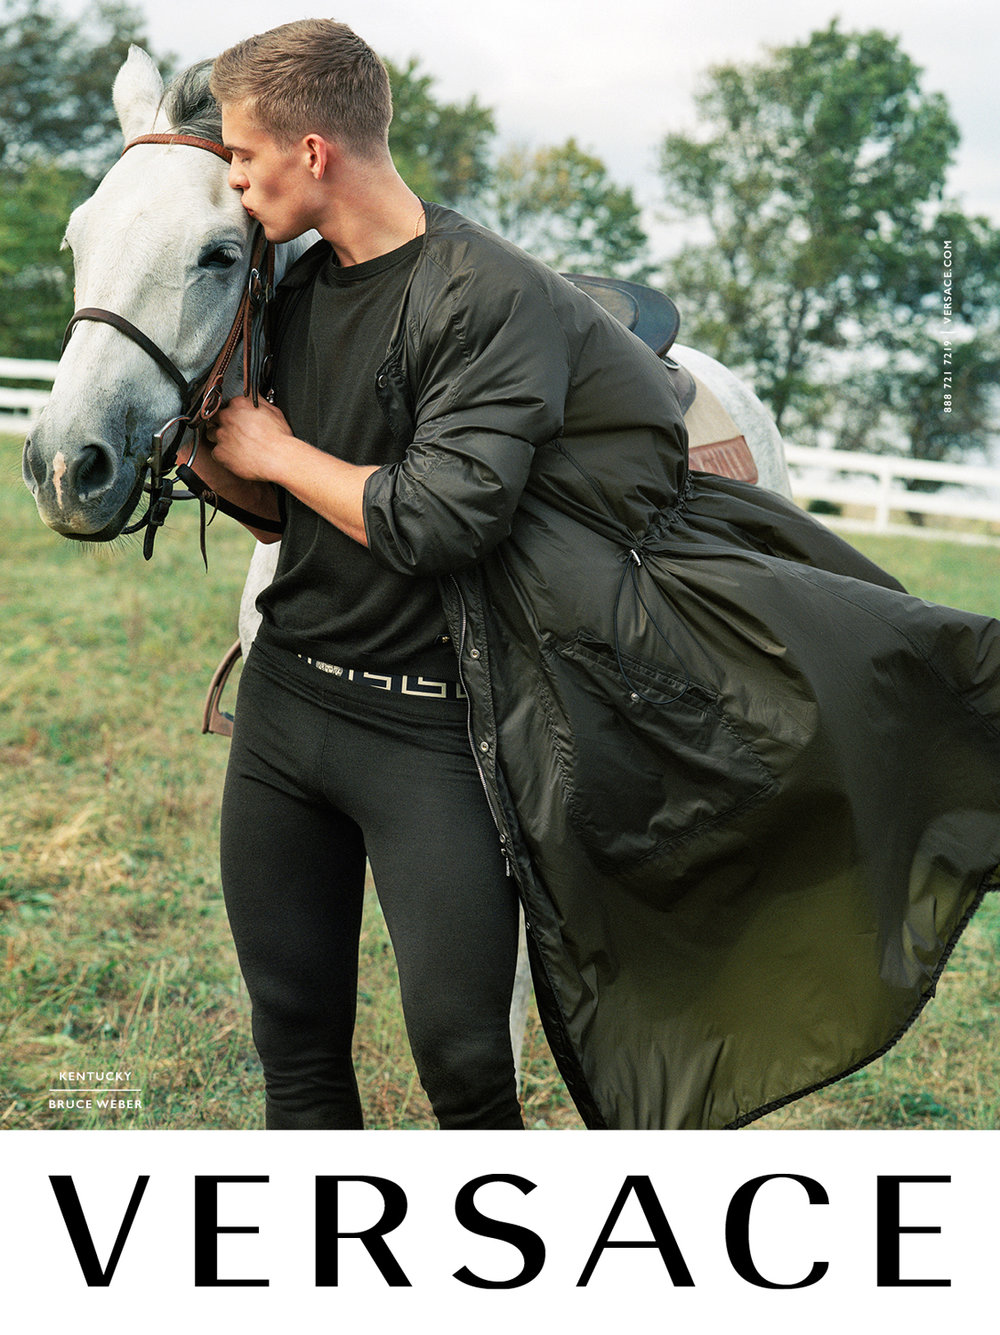 Versace Spring/Summer 2017 campaign.  Photography: Bruce Weber Art Direction: Sam Shahid Models: Mitchell Slaggert